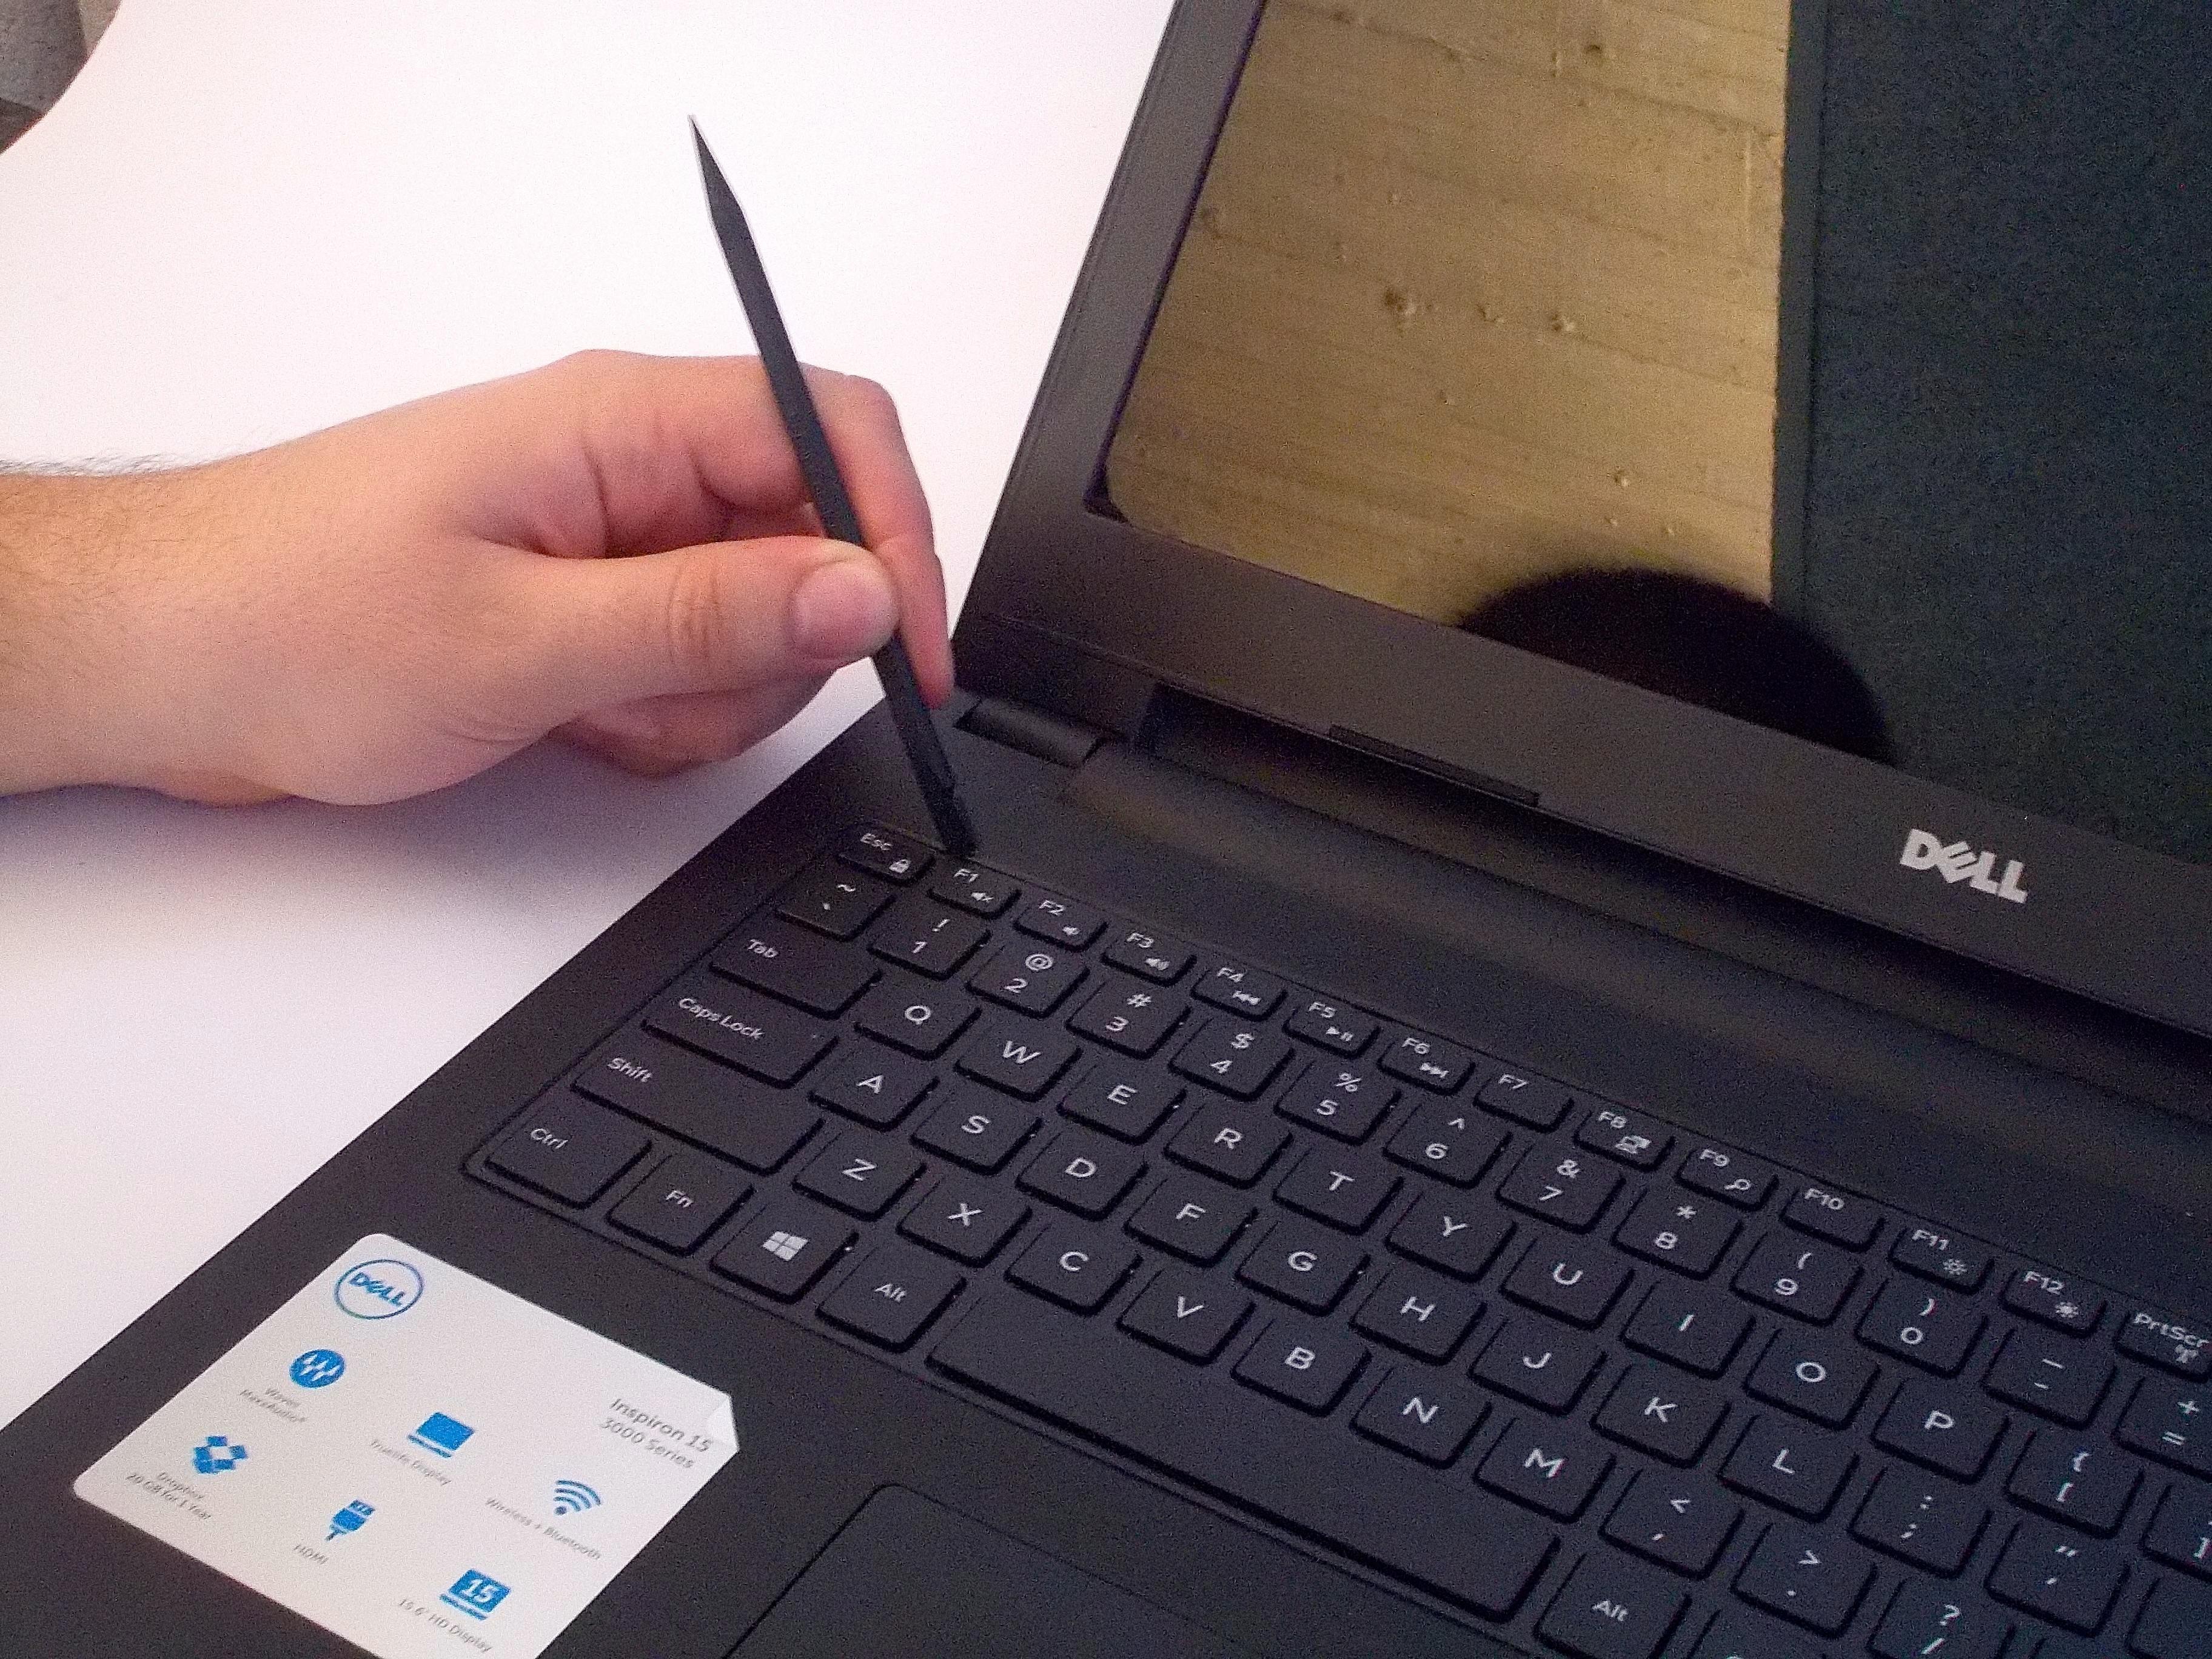 Dell Inspiron 15-3541 Repair - iFixit